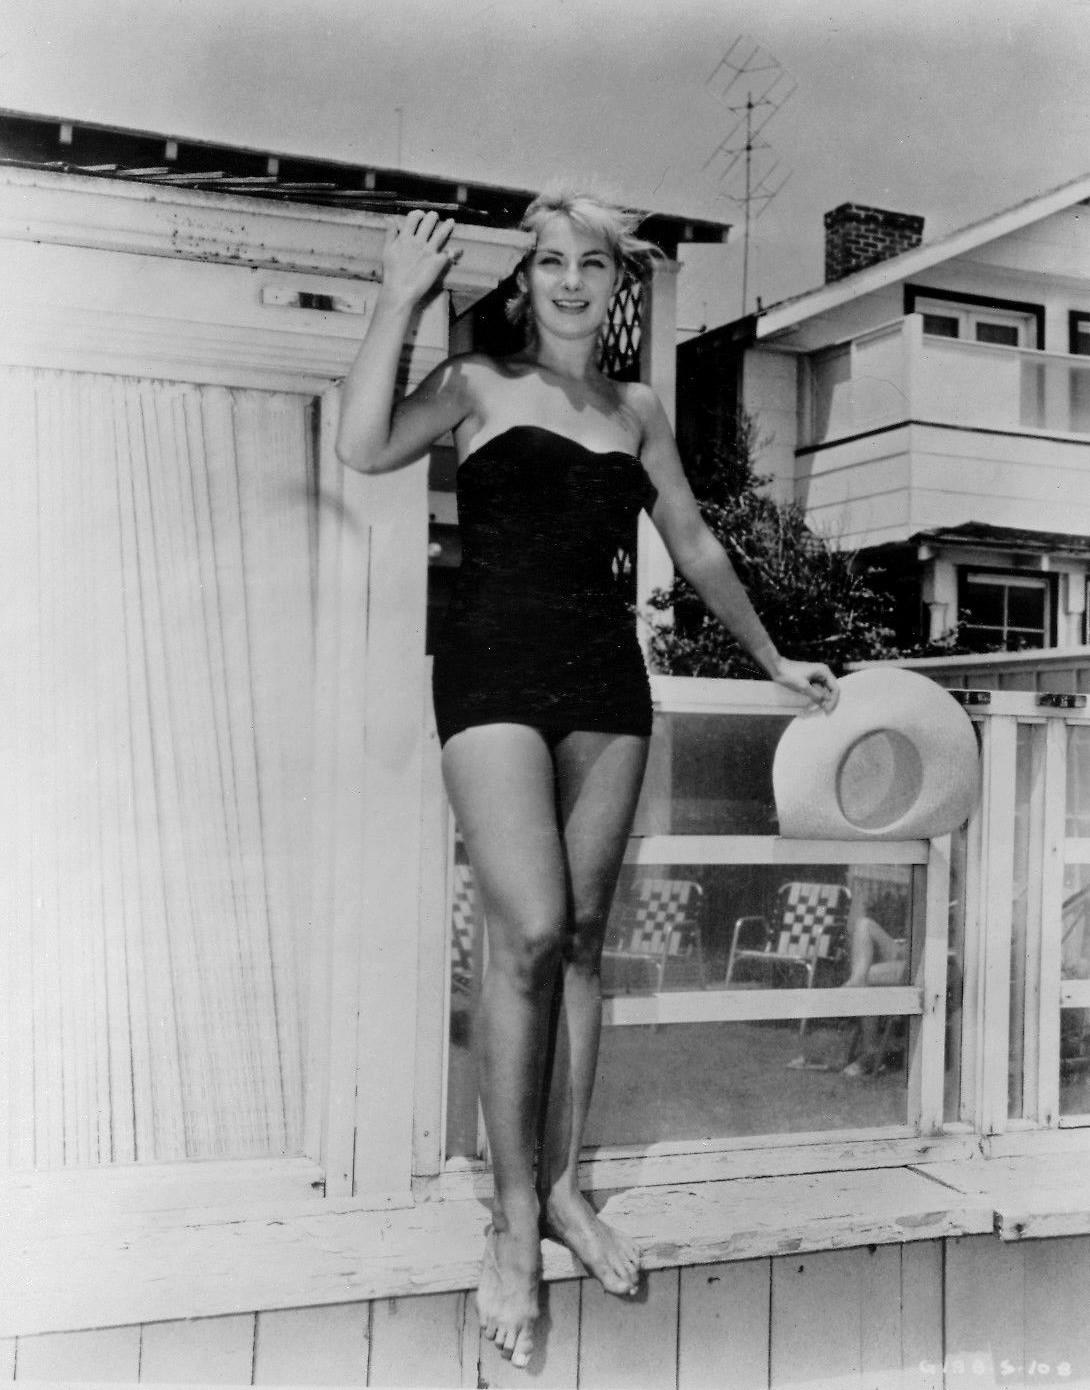 https://pics.wikifeet.com/Joanne-Woodward-Feet-3759900.jpg